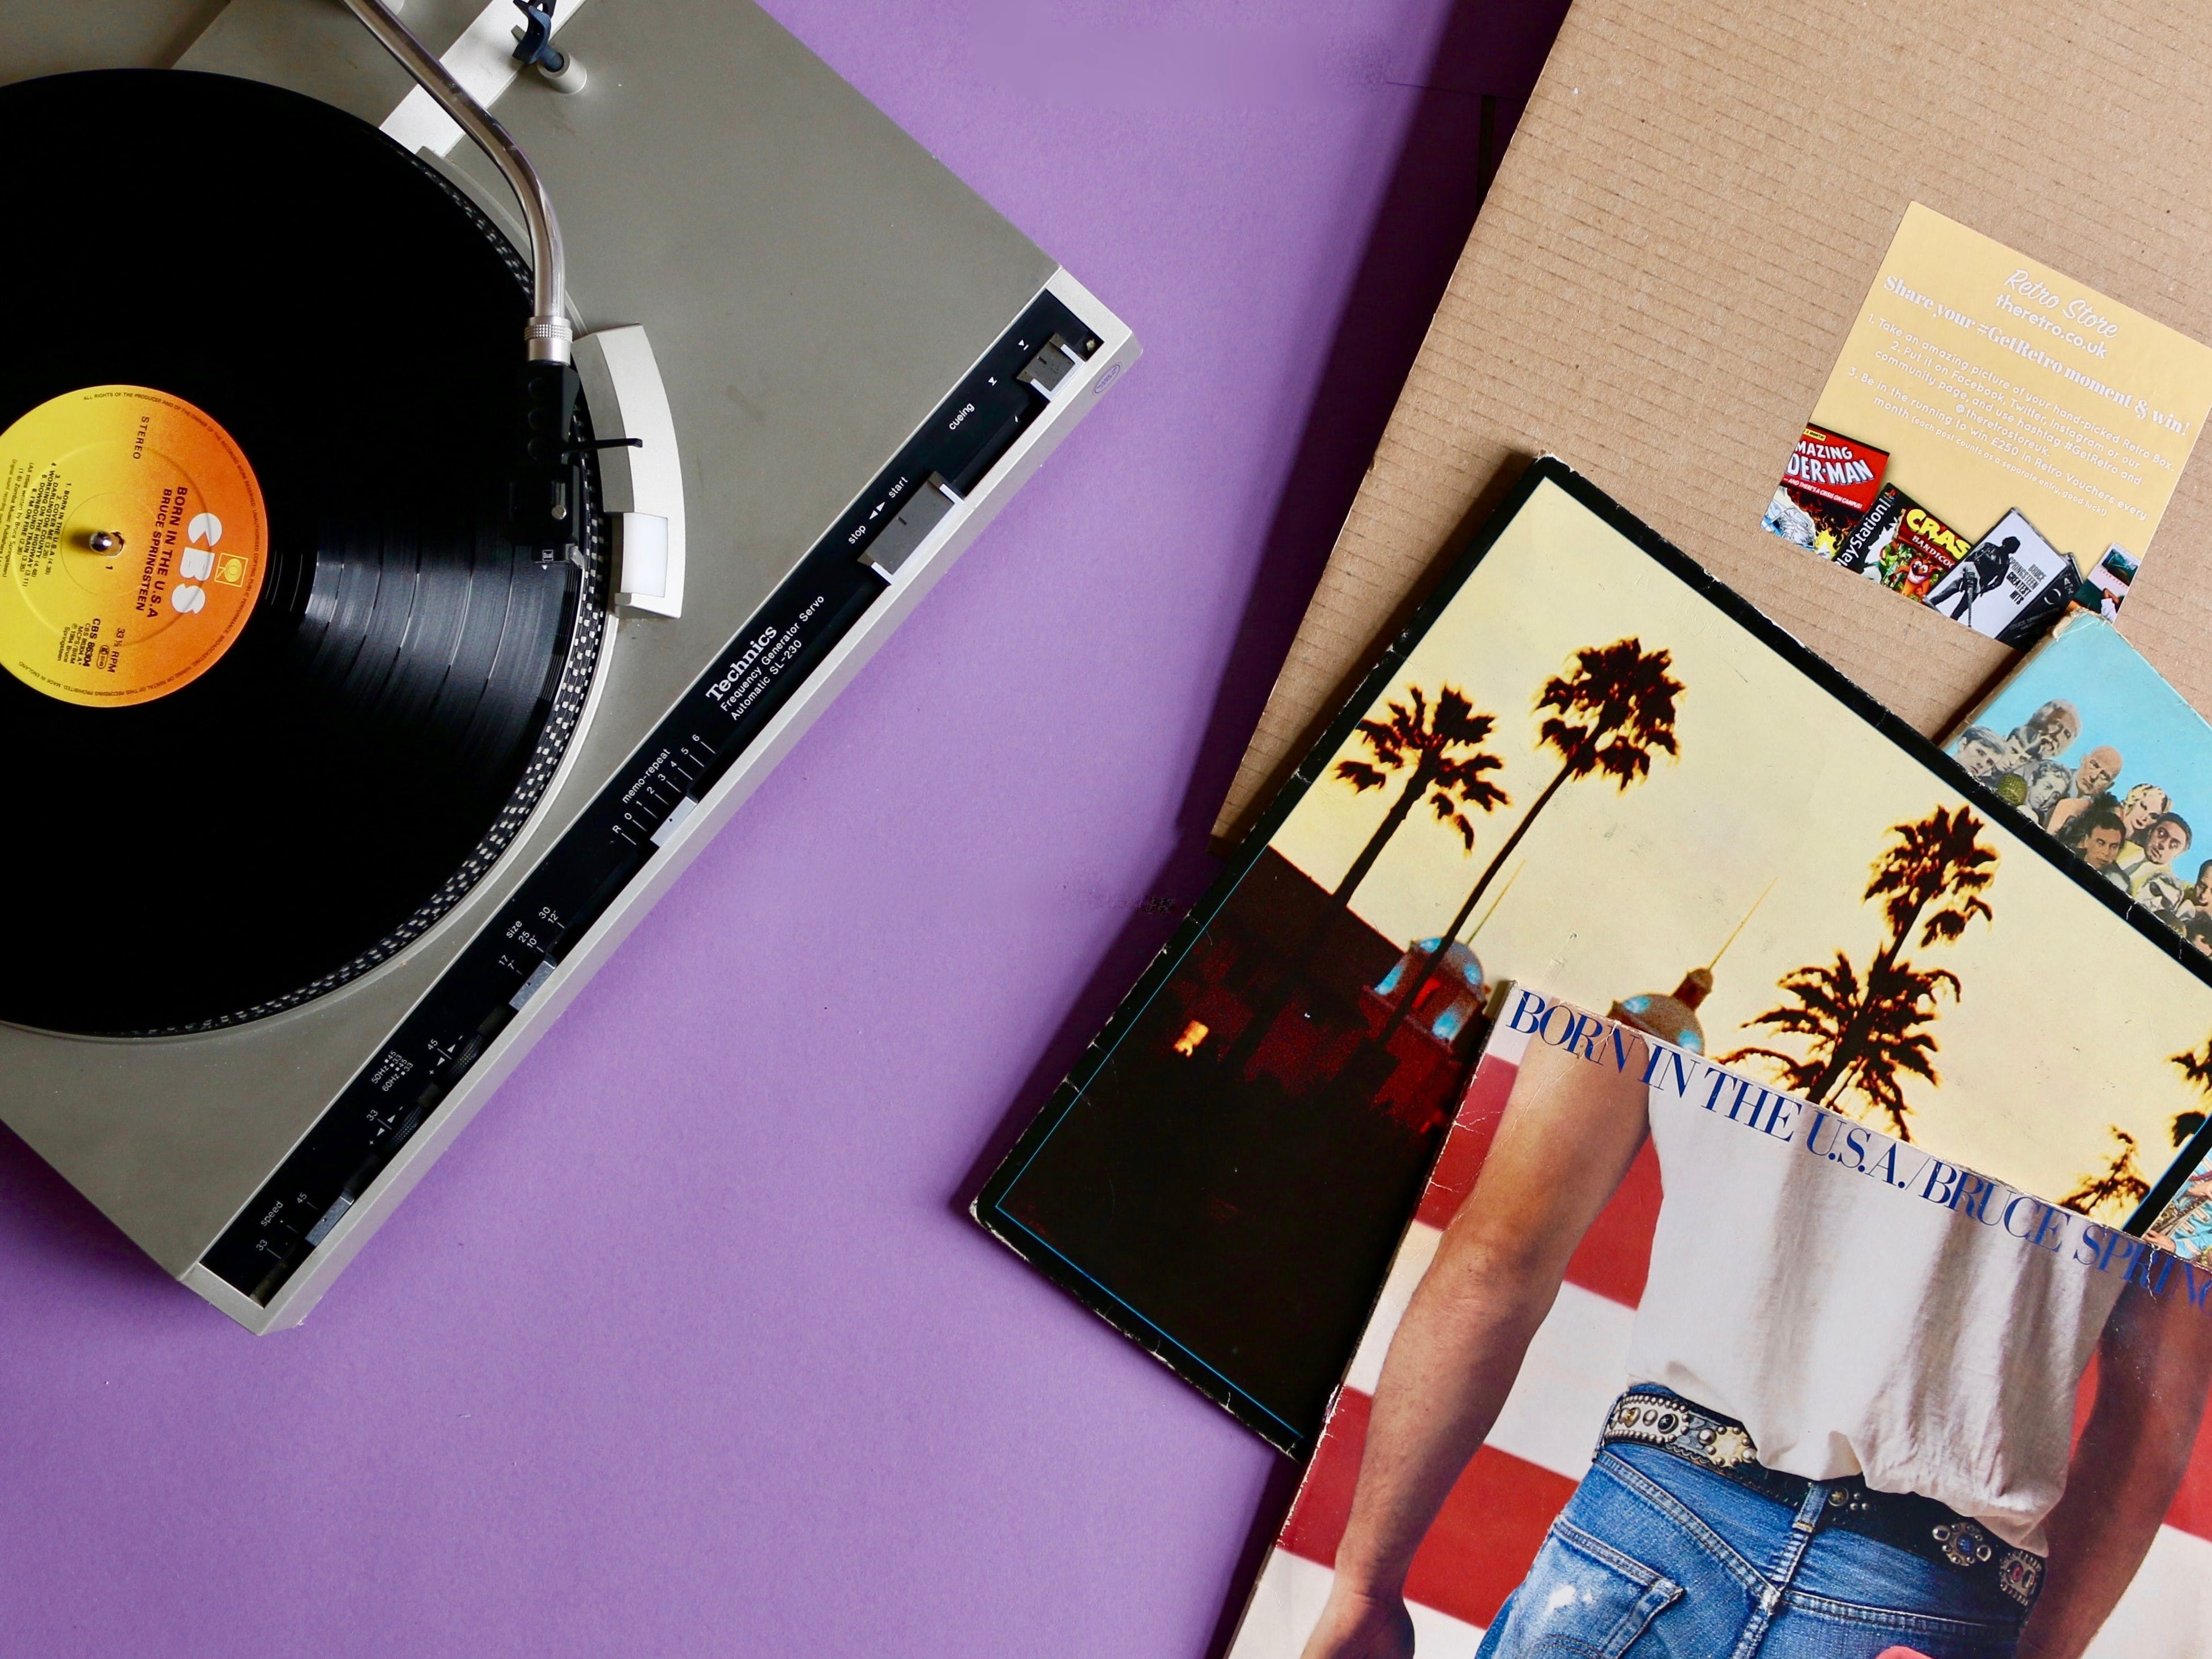 Retro Store Monthly Vinyl Club Subscription Box